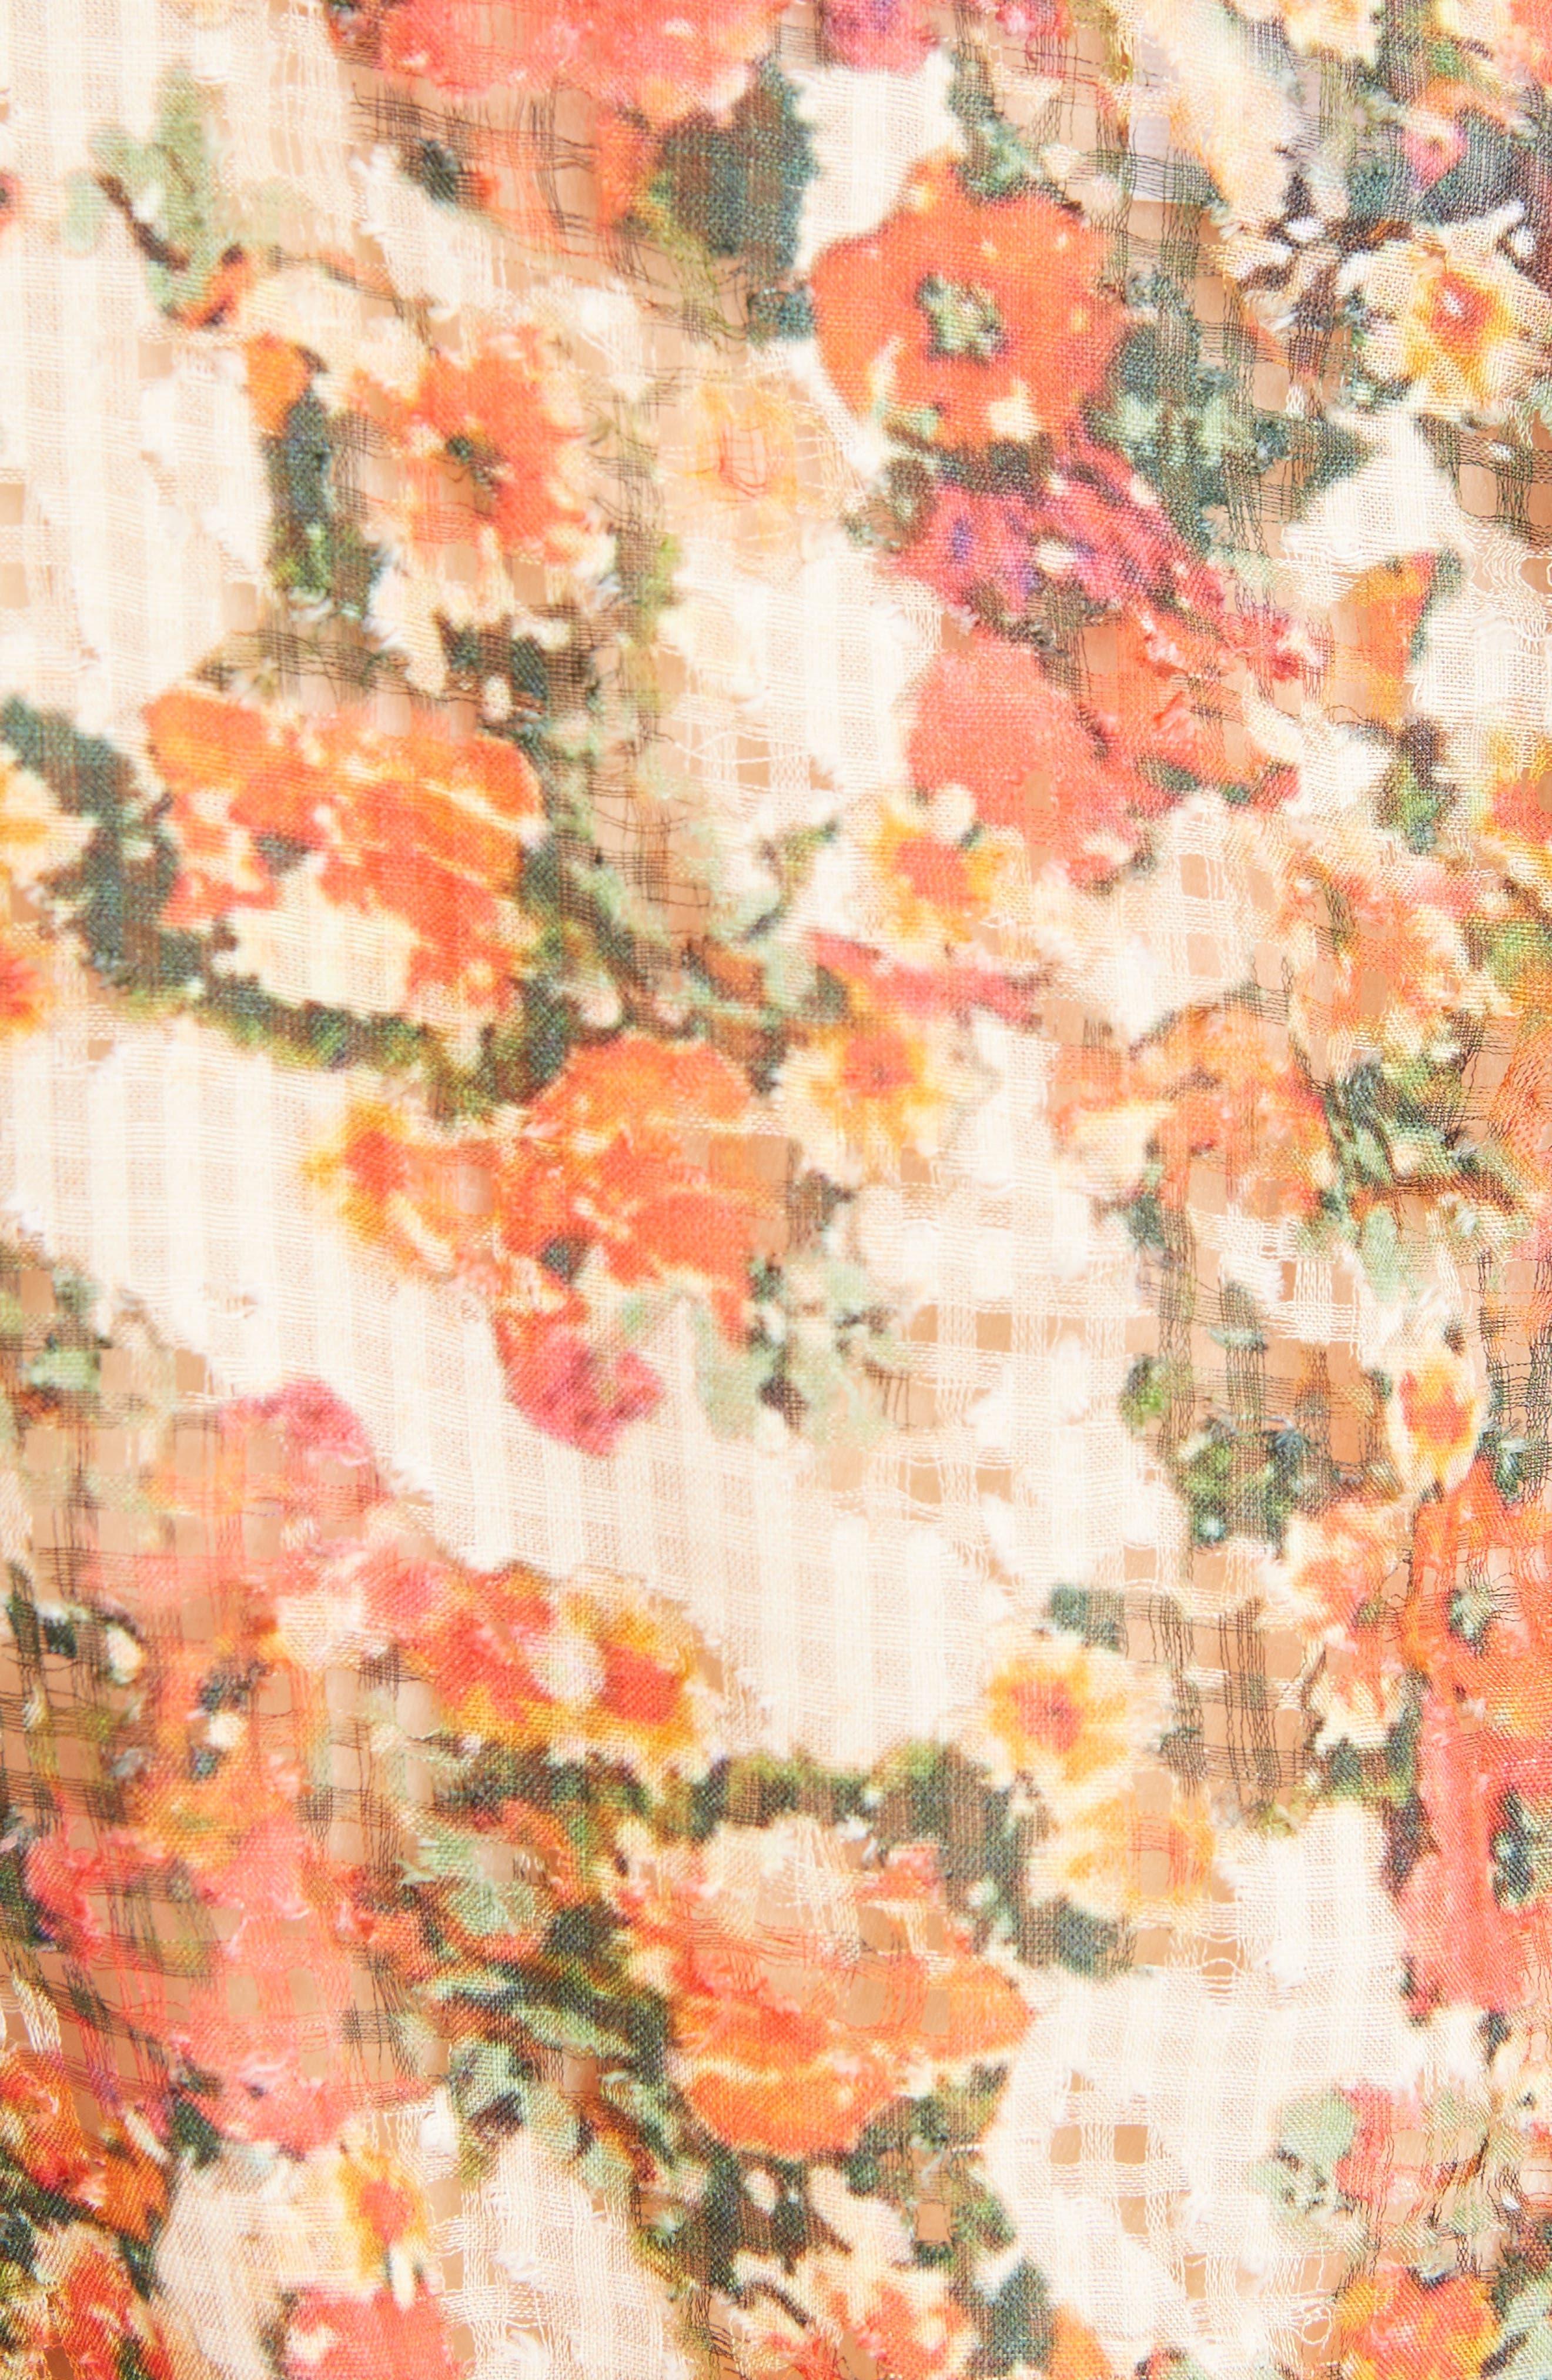 Floral Print Ruffle Dress,                             Alternate thumbnail 5, color,                             600